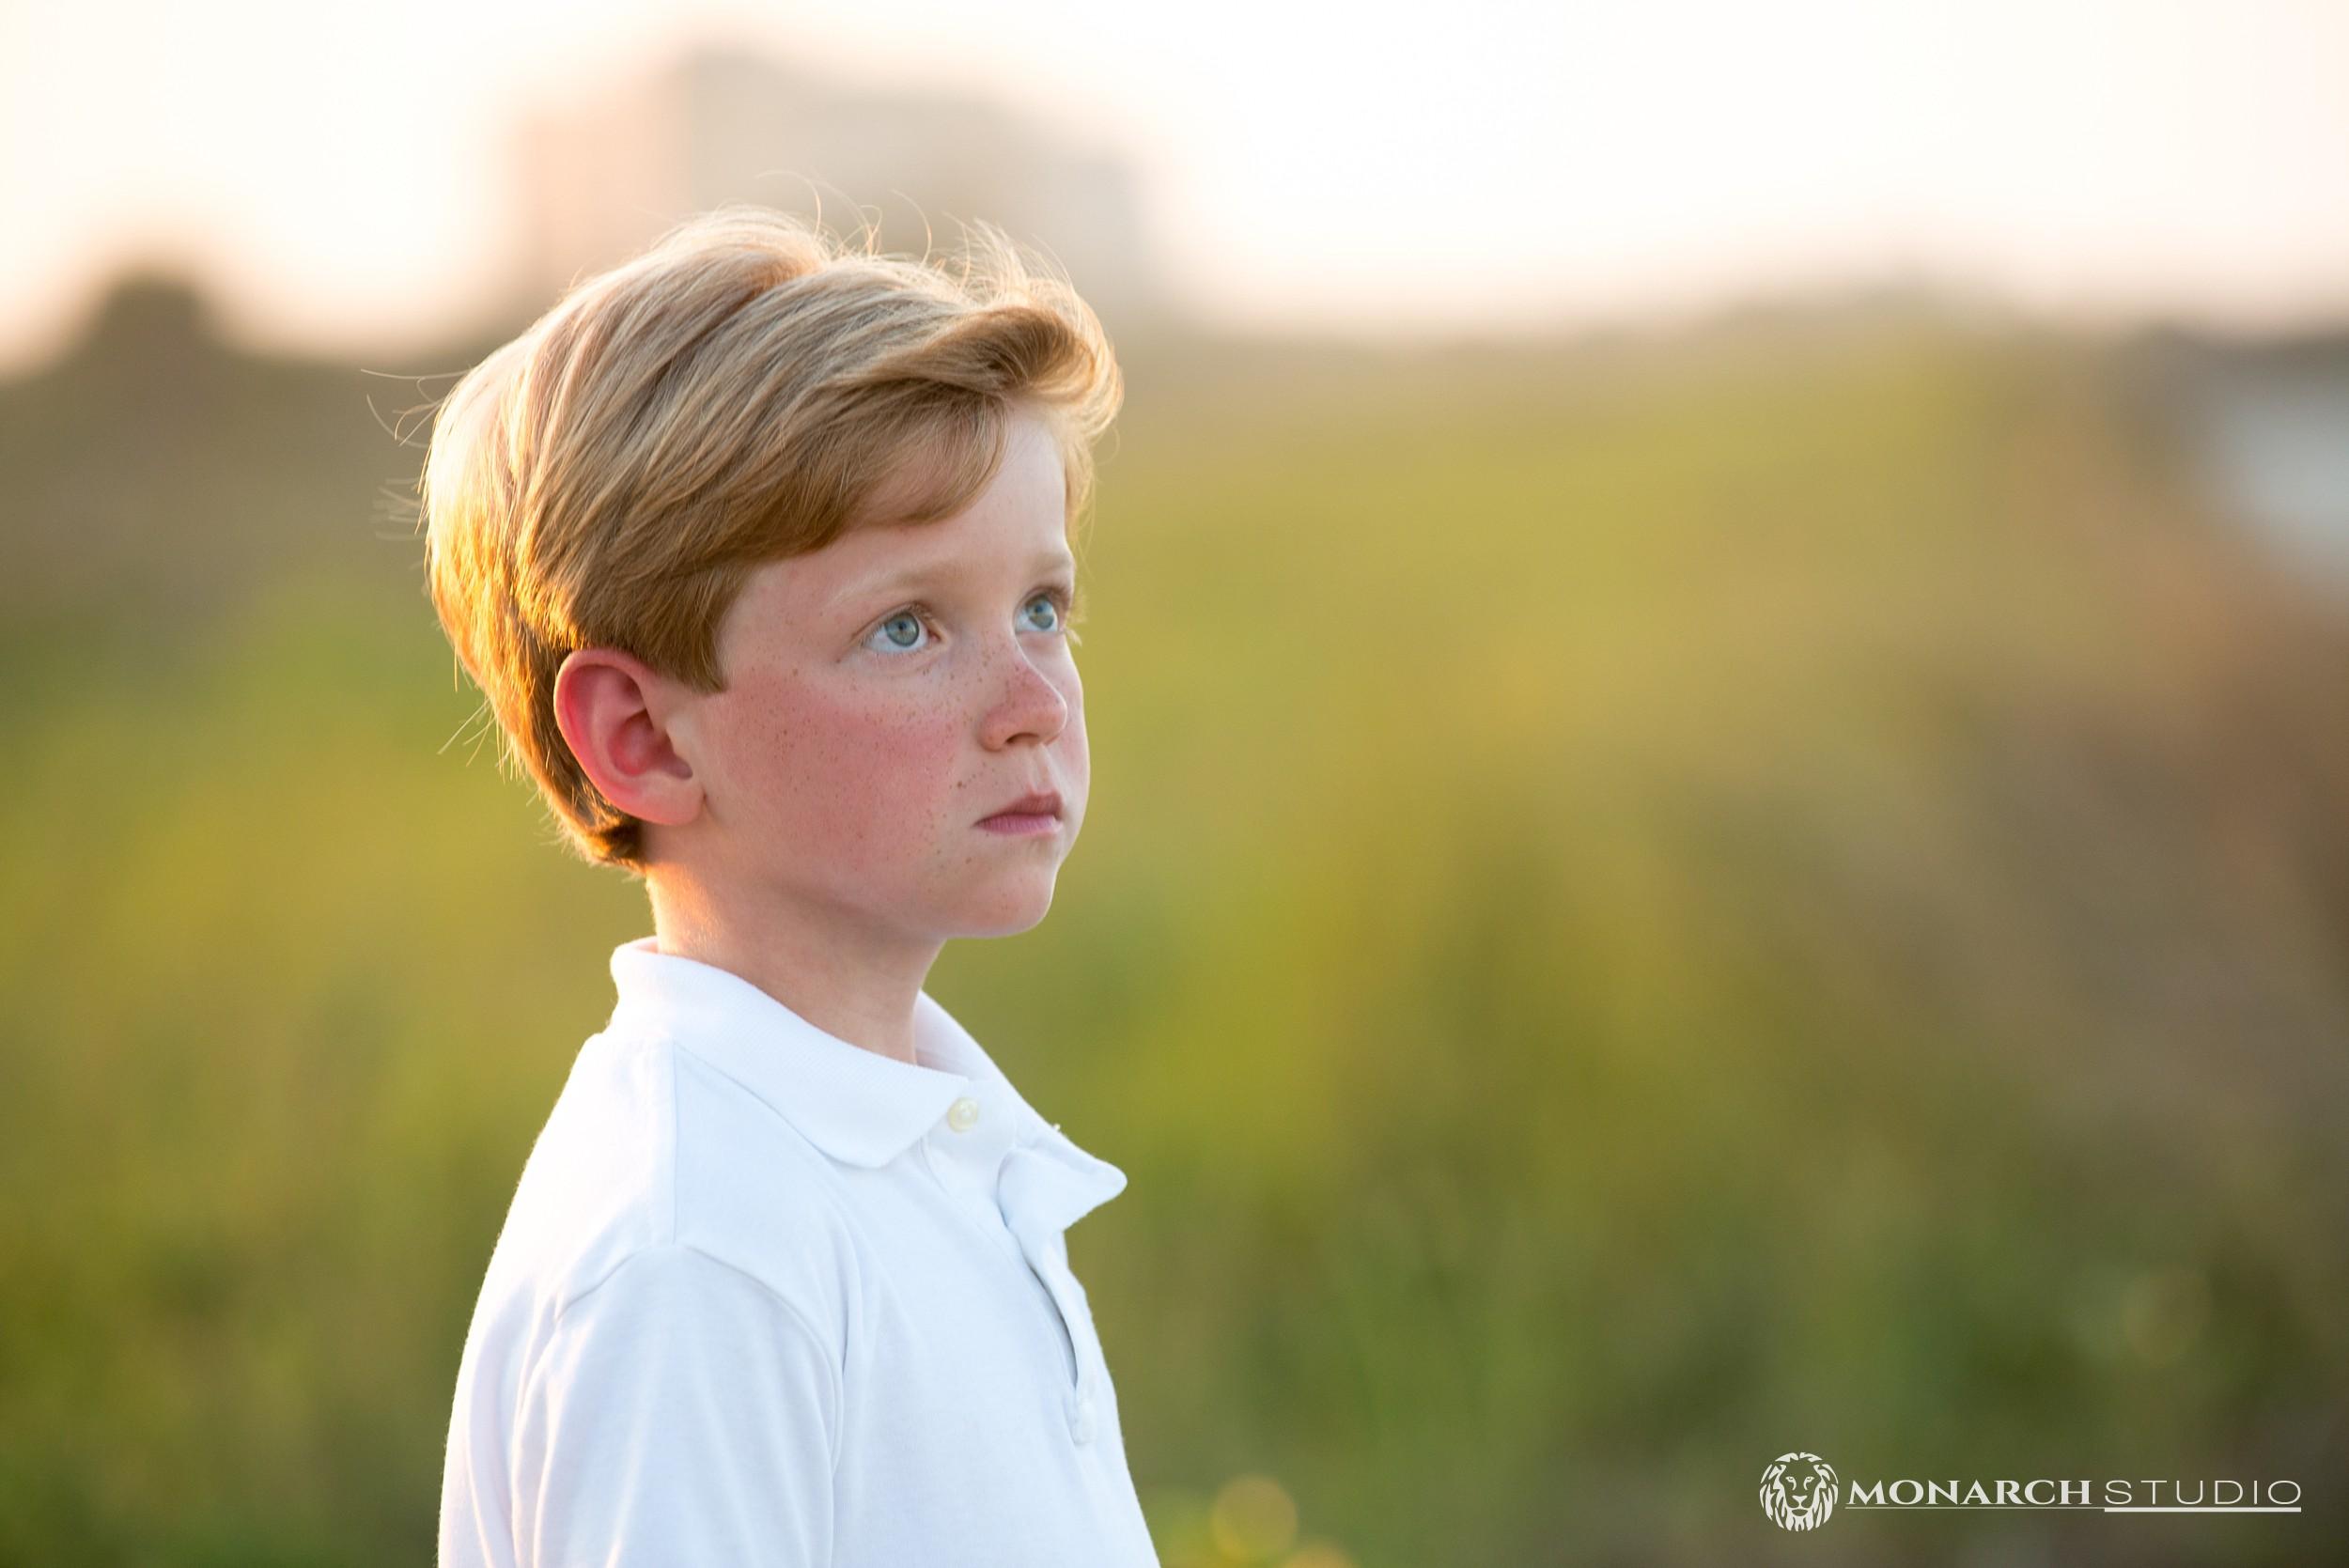 St-Augustine-Beach-Family-Portrait-Photographer_0011.jpg